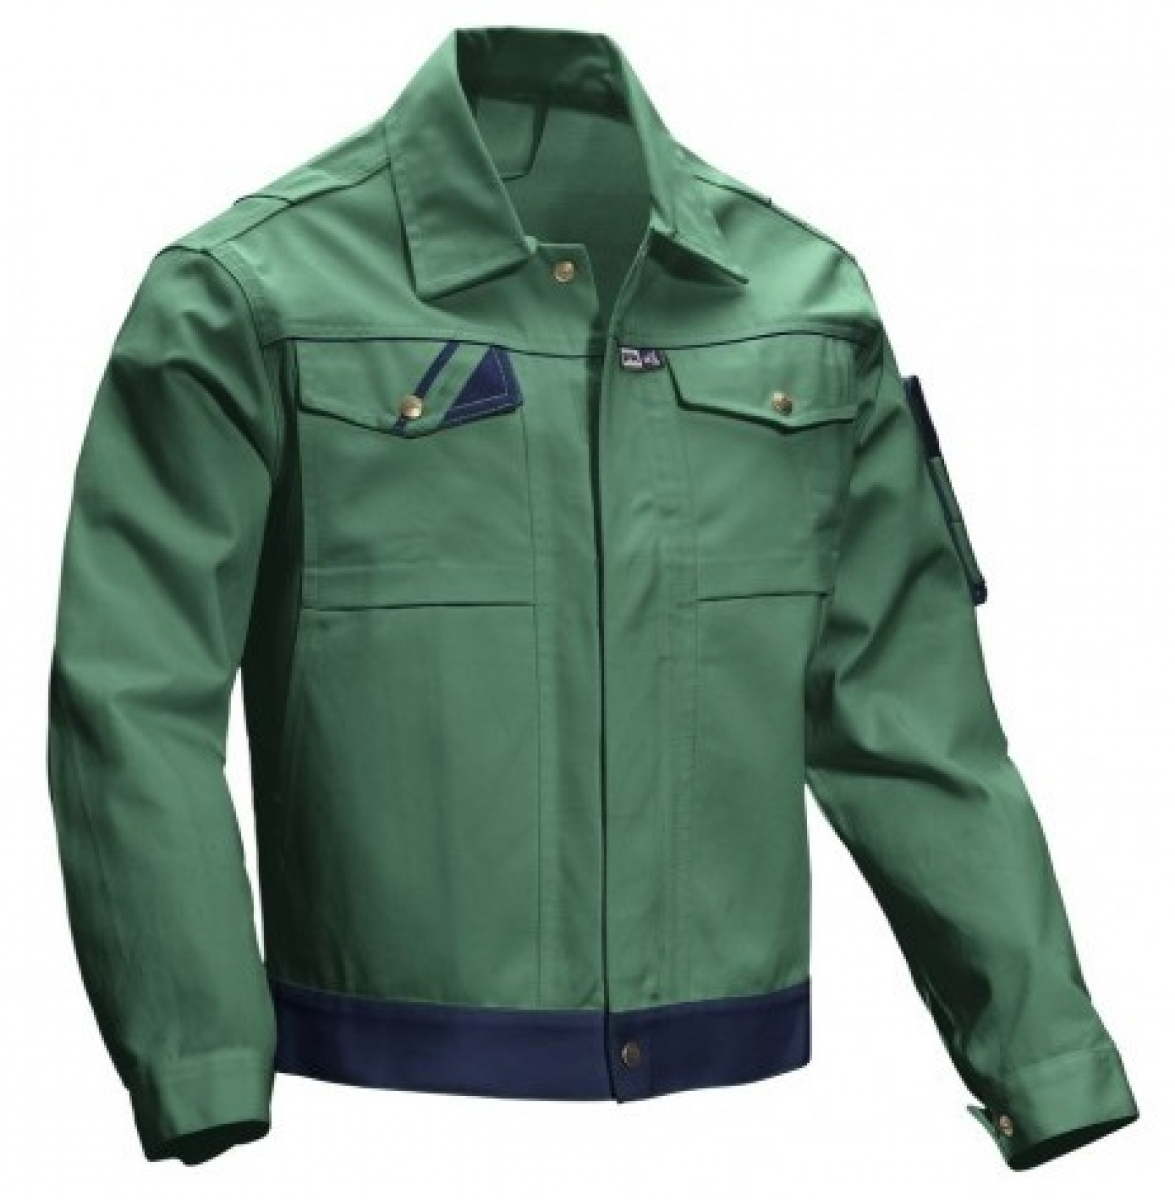 PKA-Arbeits-Berufs-Bund-Jacke, Blouson, Threeline Perfekt, MG320, grün